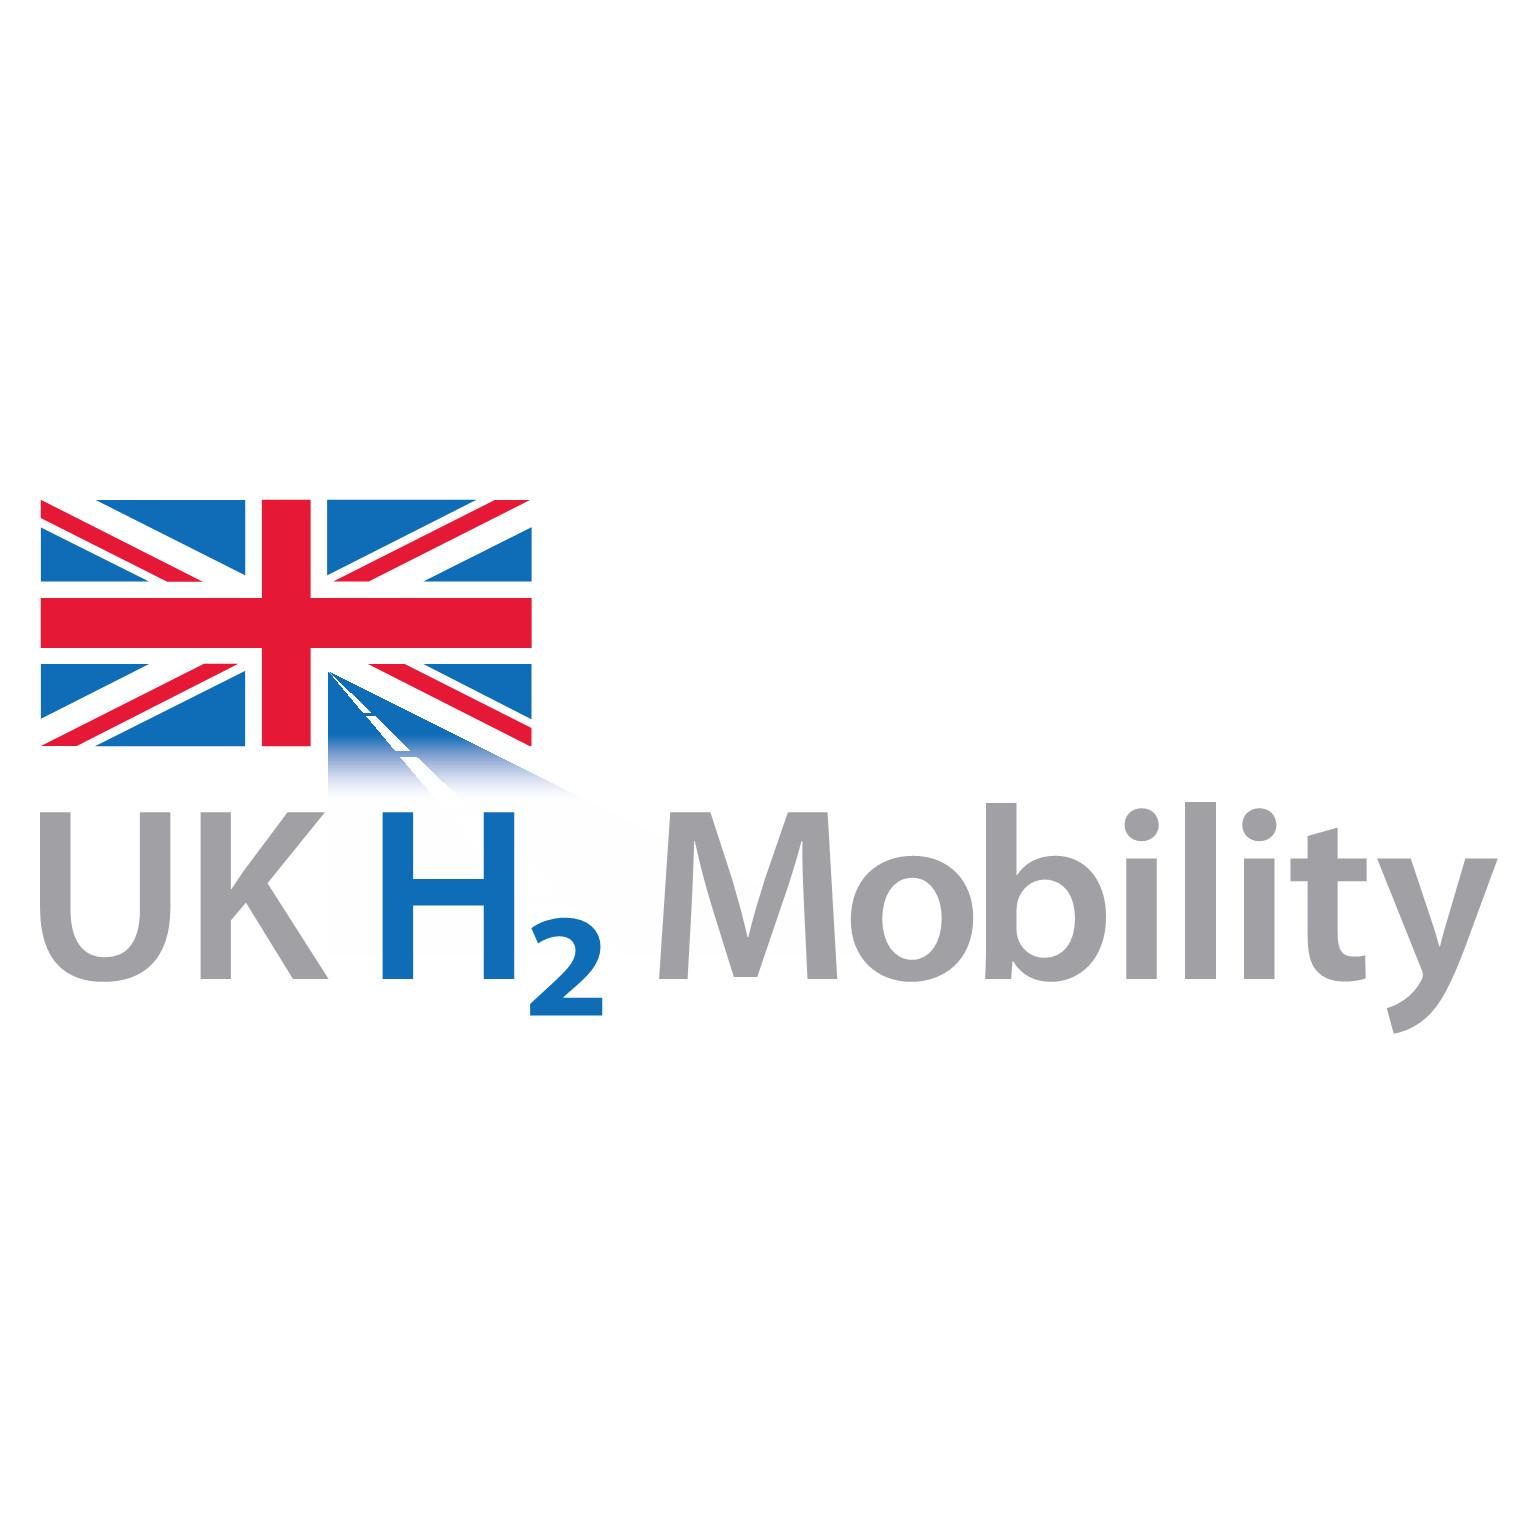 UK H2 Mobility logo